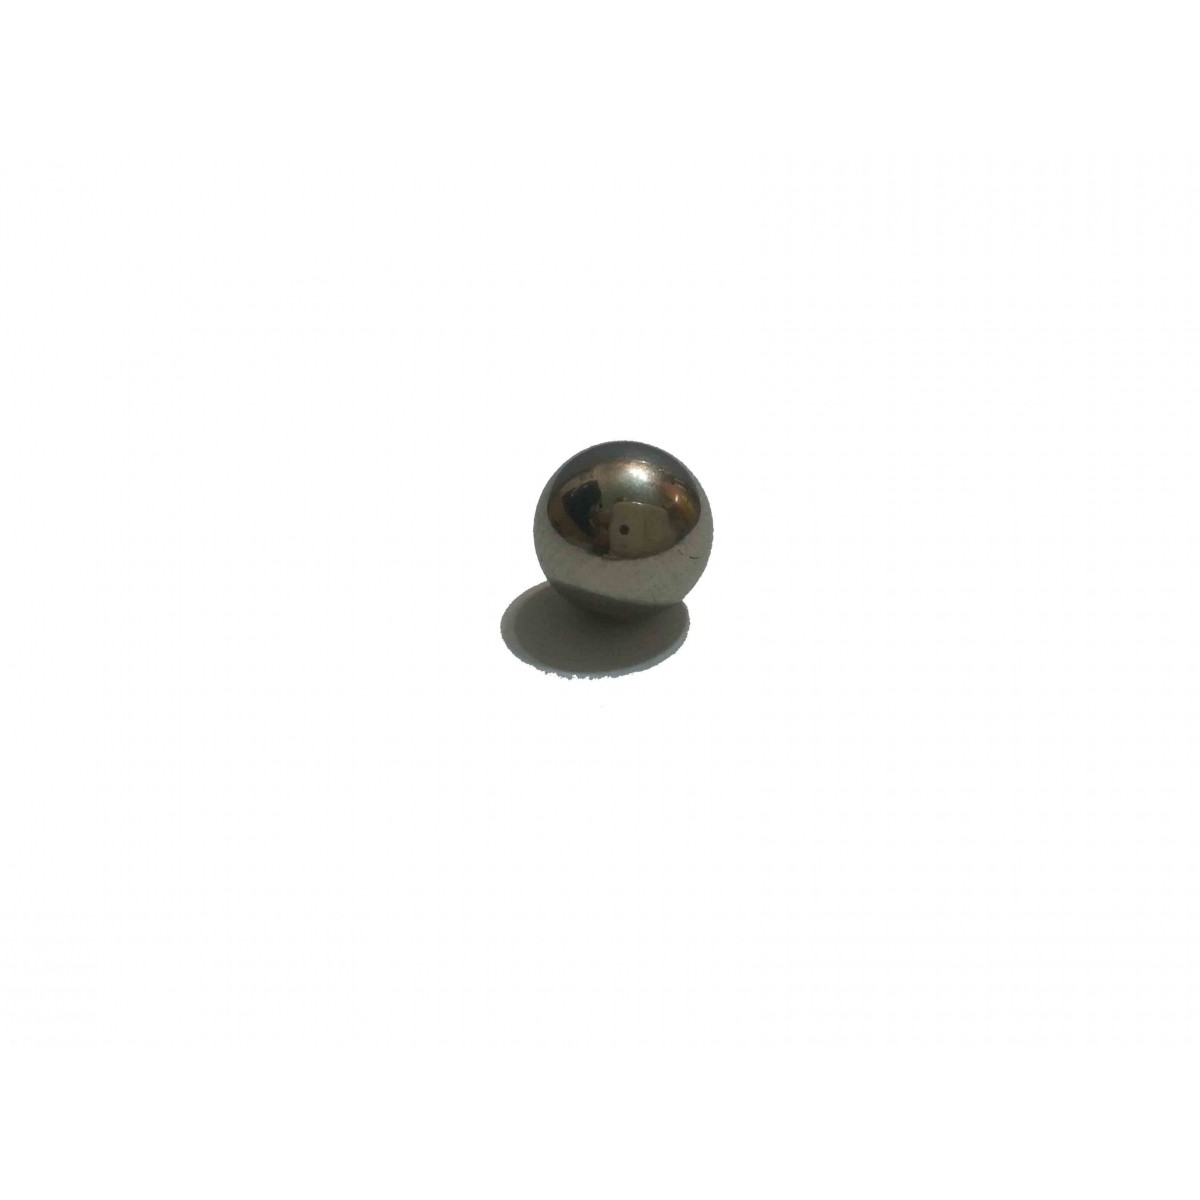 Imã De Neodímio / Super Forte / Esfera 10mm * 10 Peças